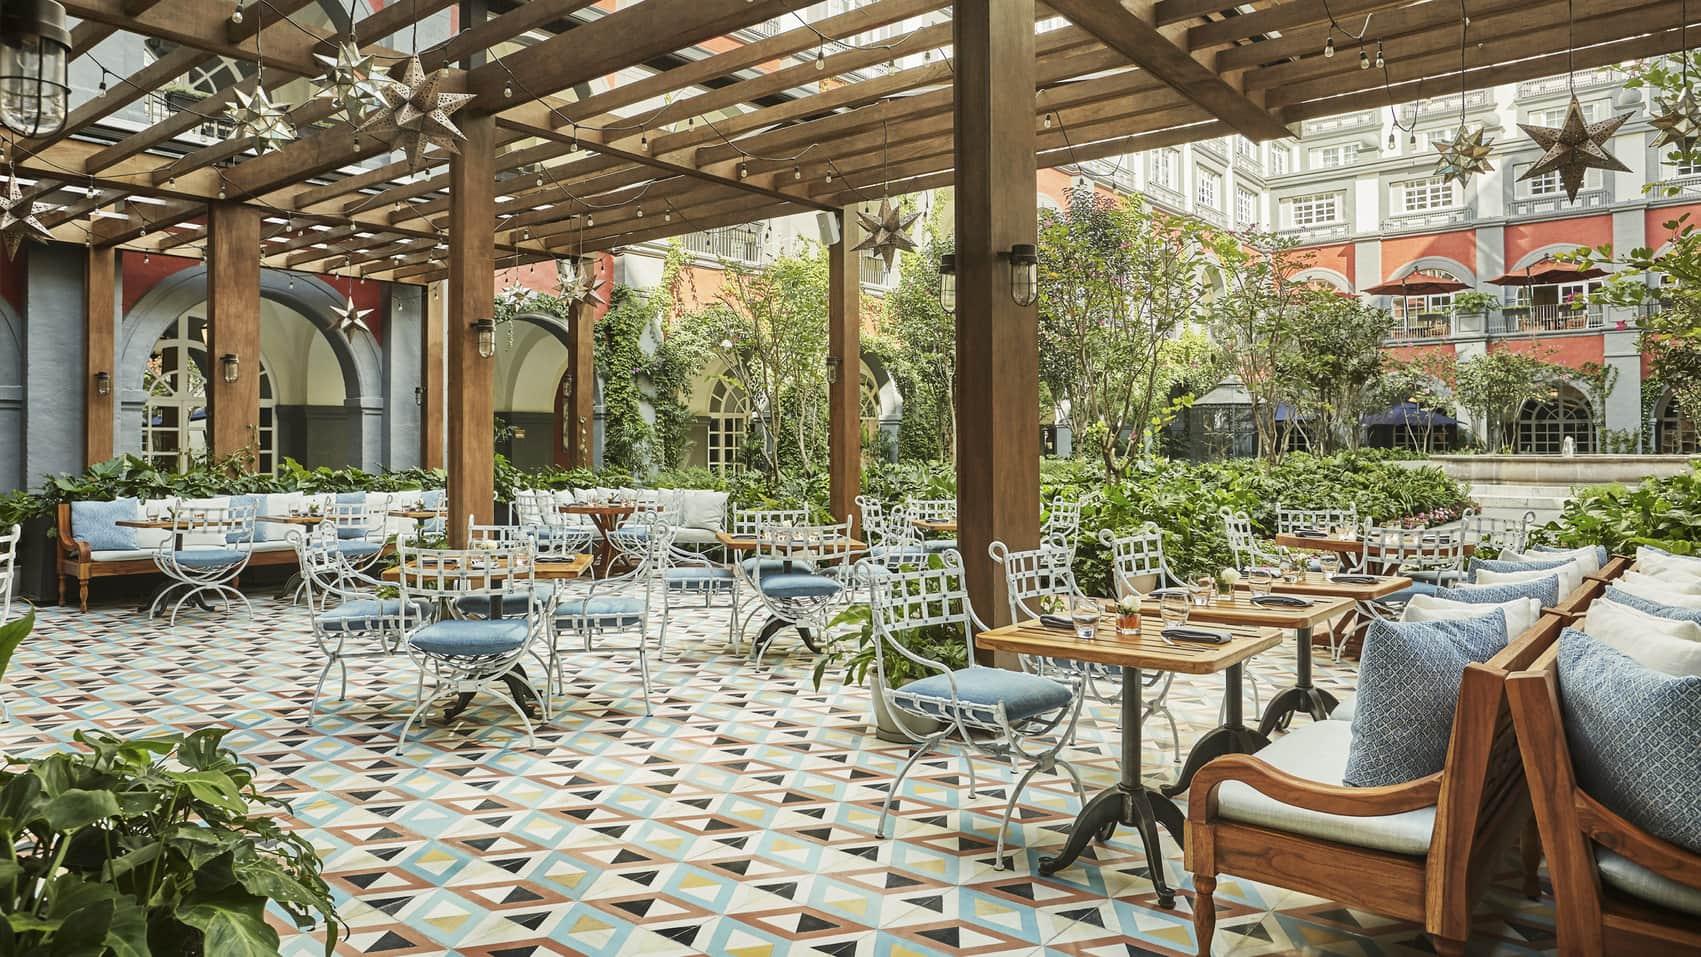 The Four Seasons Mexico City, our lavish summit HQ